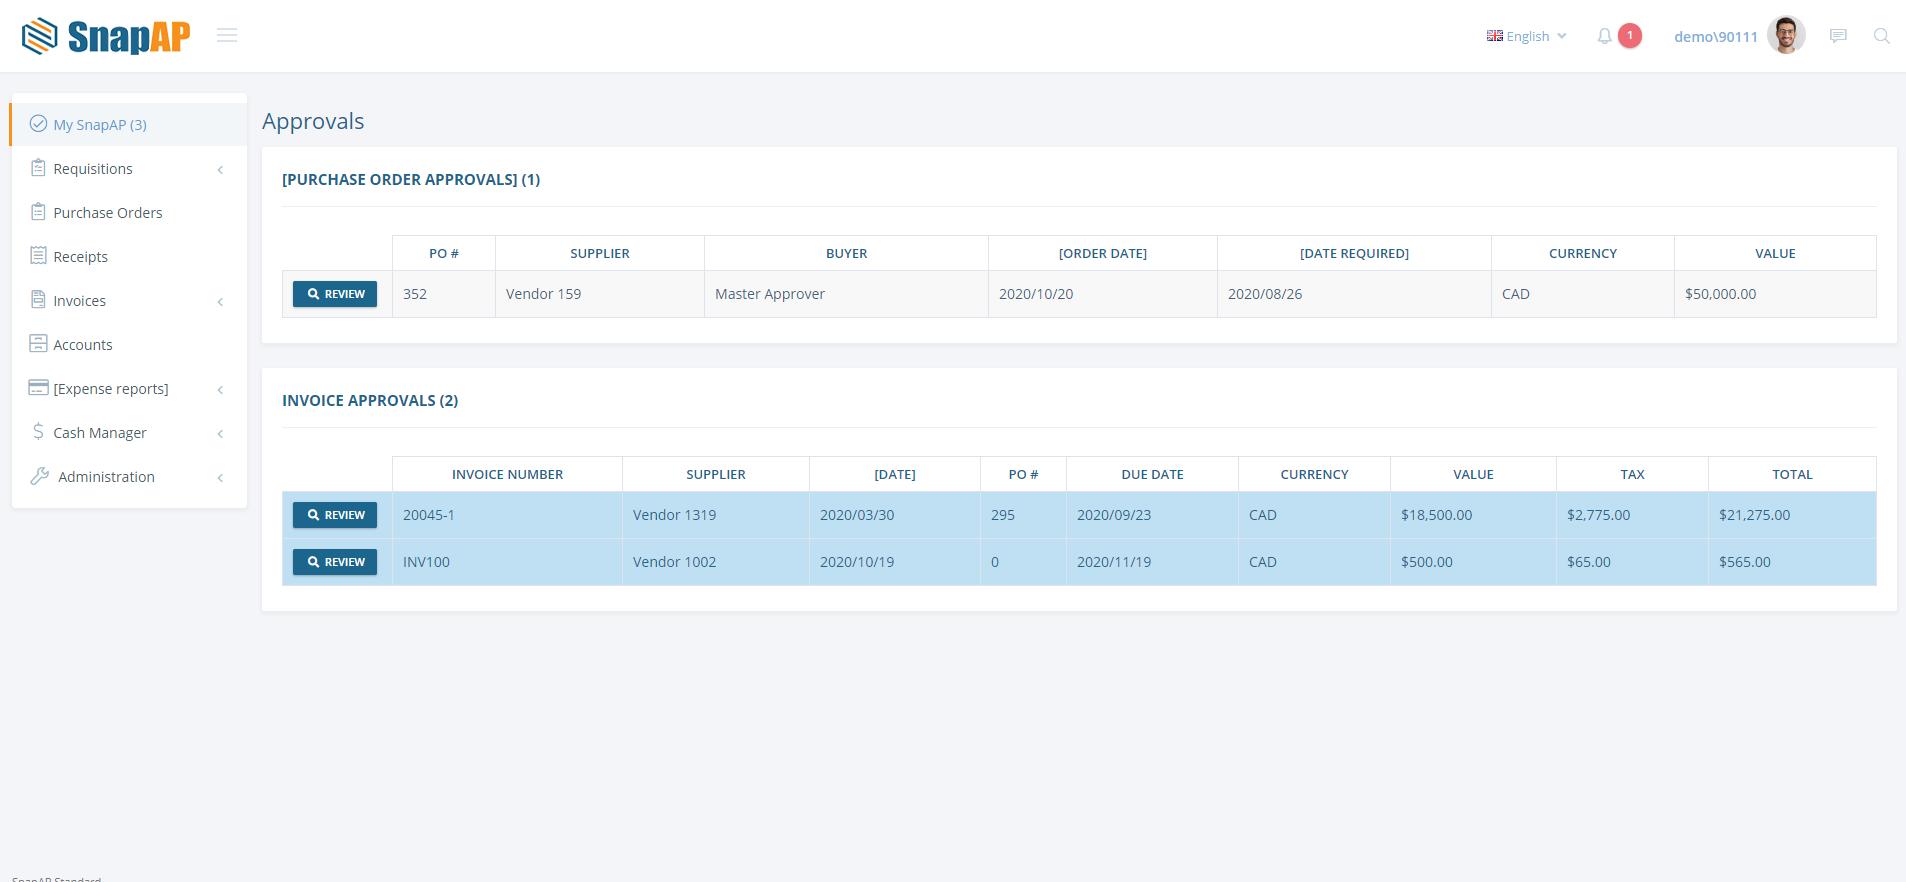 SnapAP Software - Streamline approval process